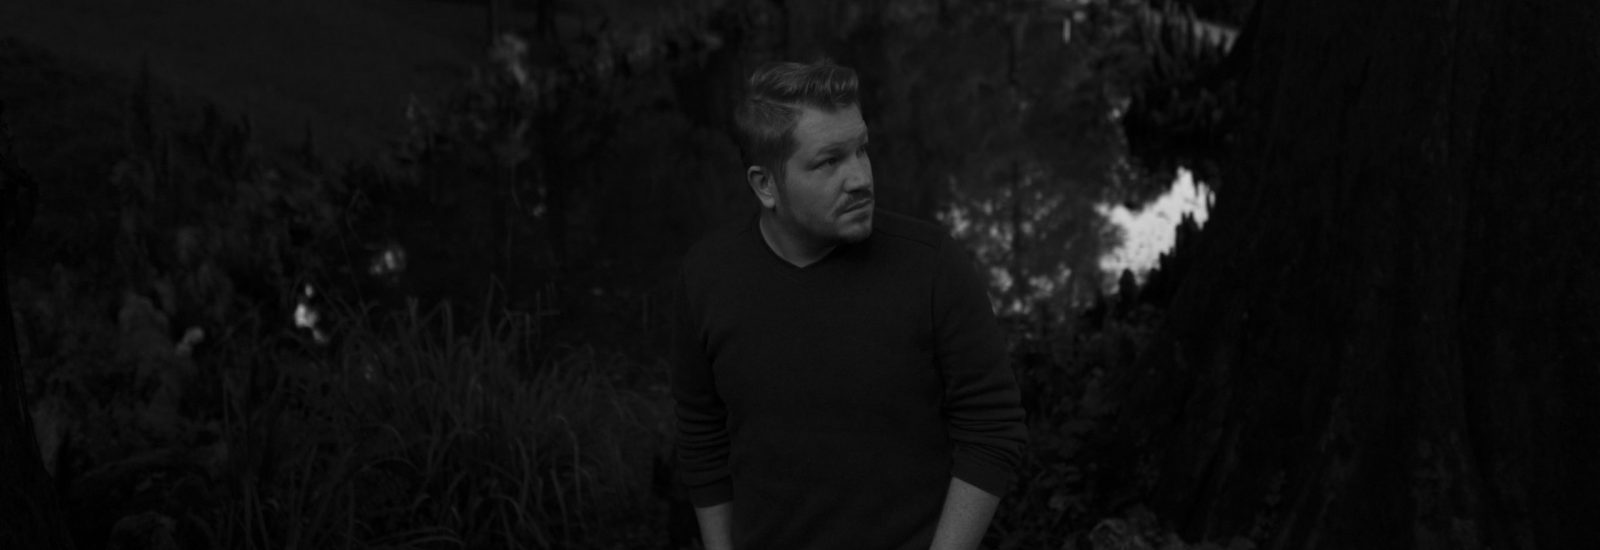 Matthew S aka Matteo Scapin music artist - producer